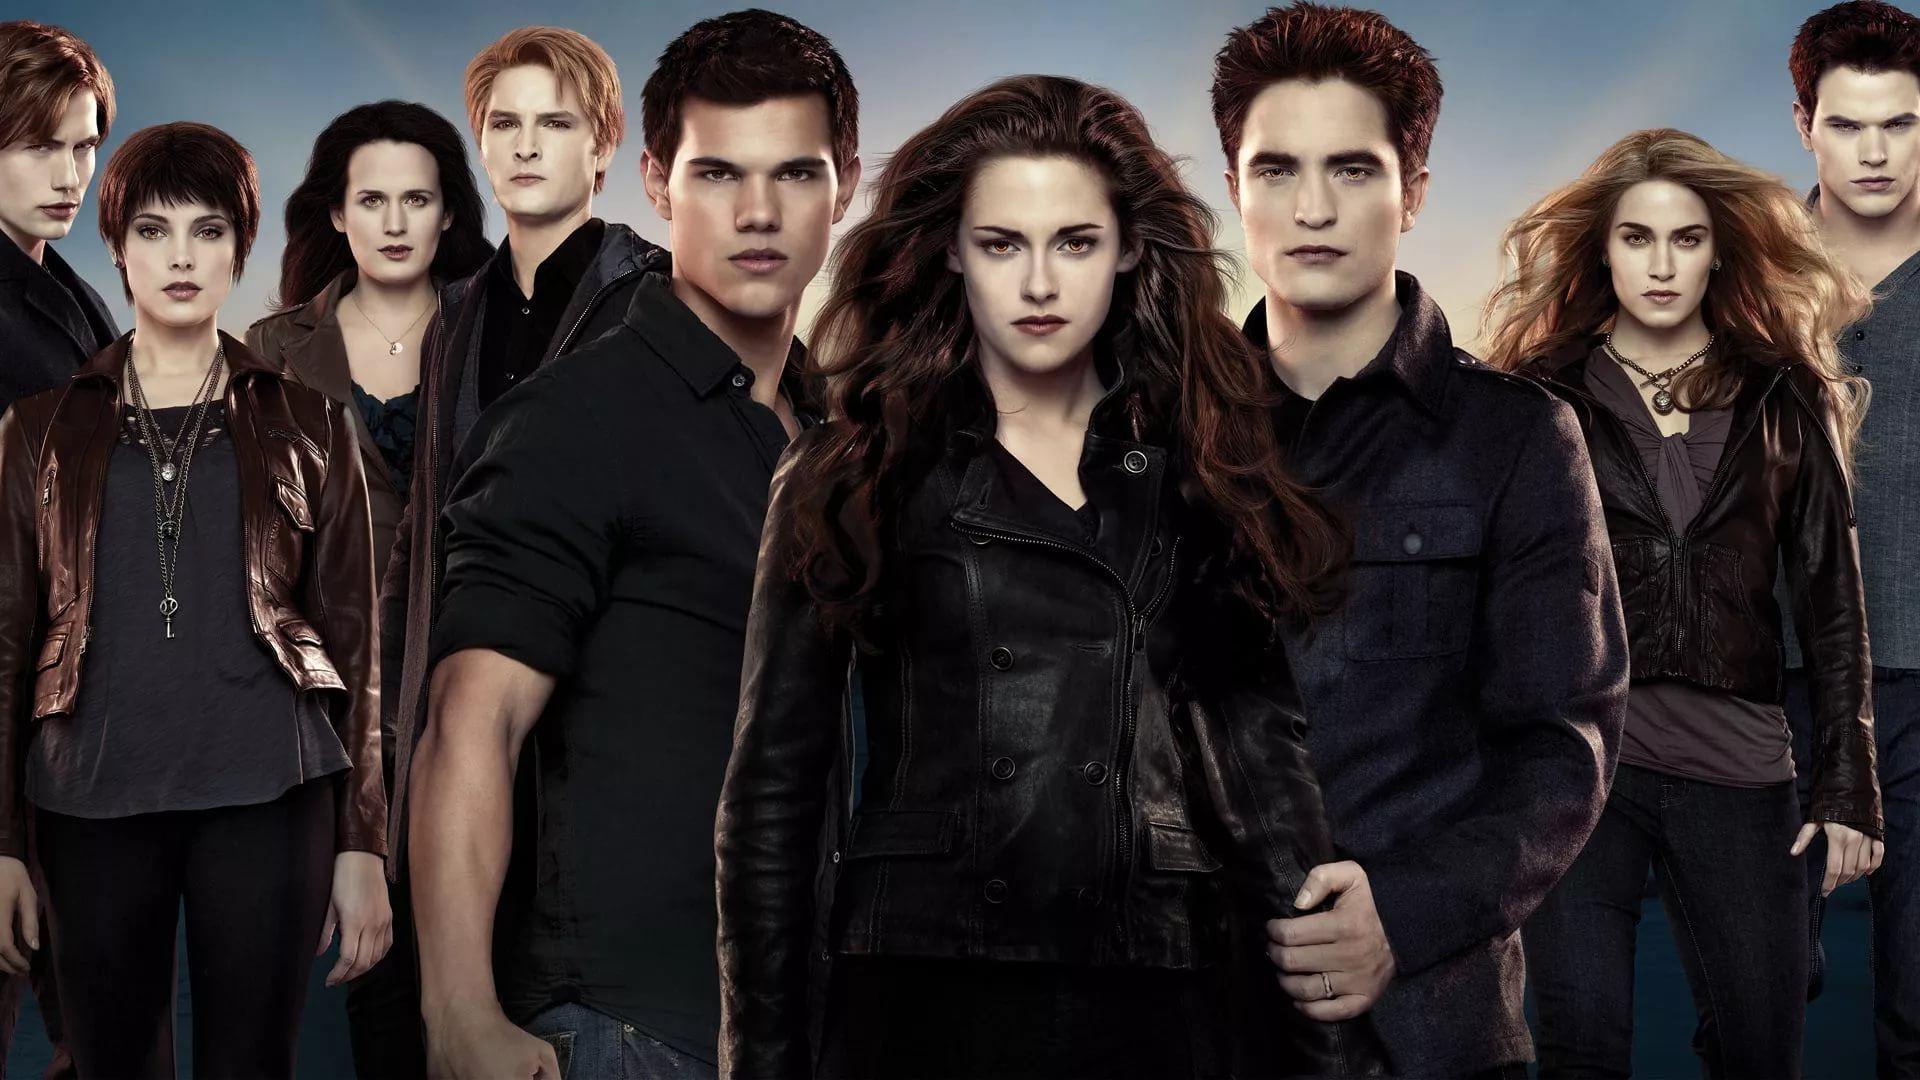 Twilight Saga Free Desktop Wallpaper